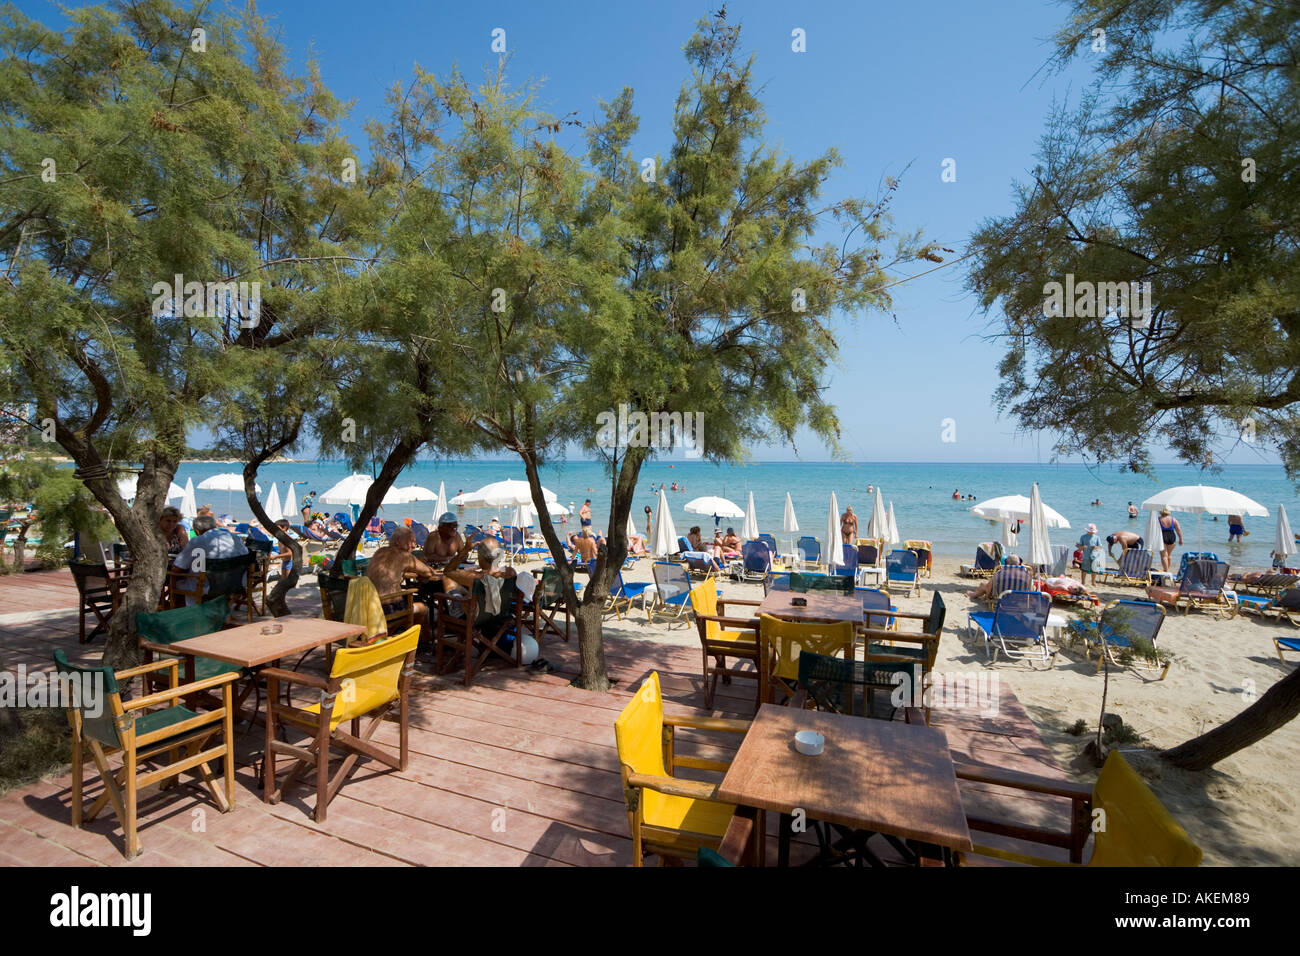 Beachfront Taverna, Tsilivi, Zakynthos, Ionian Islands, Greece - Stock Image